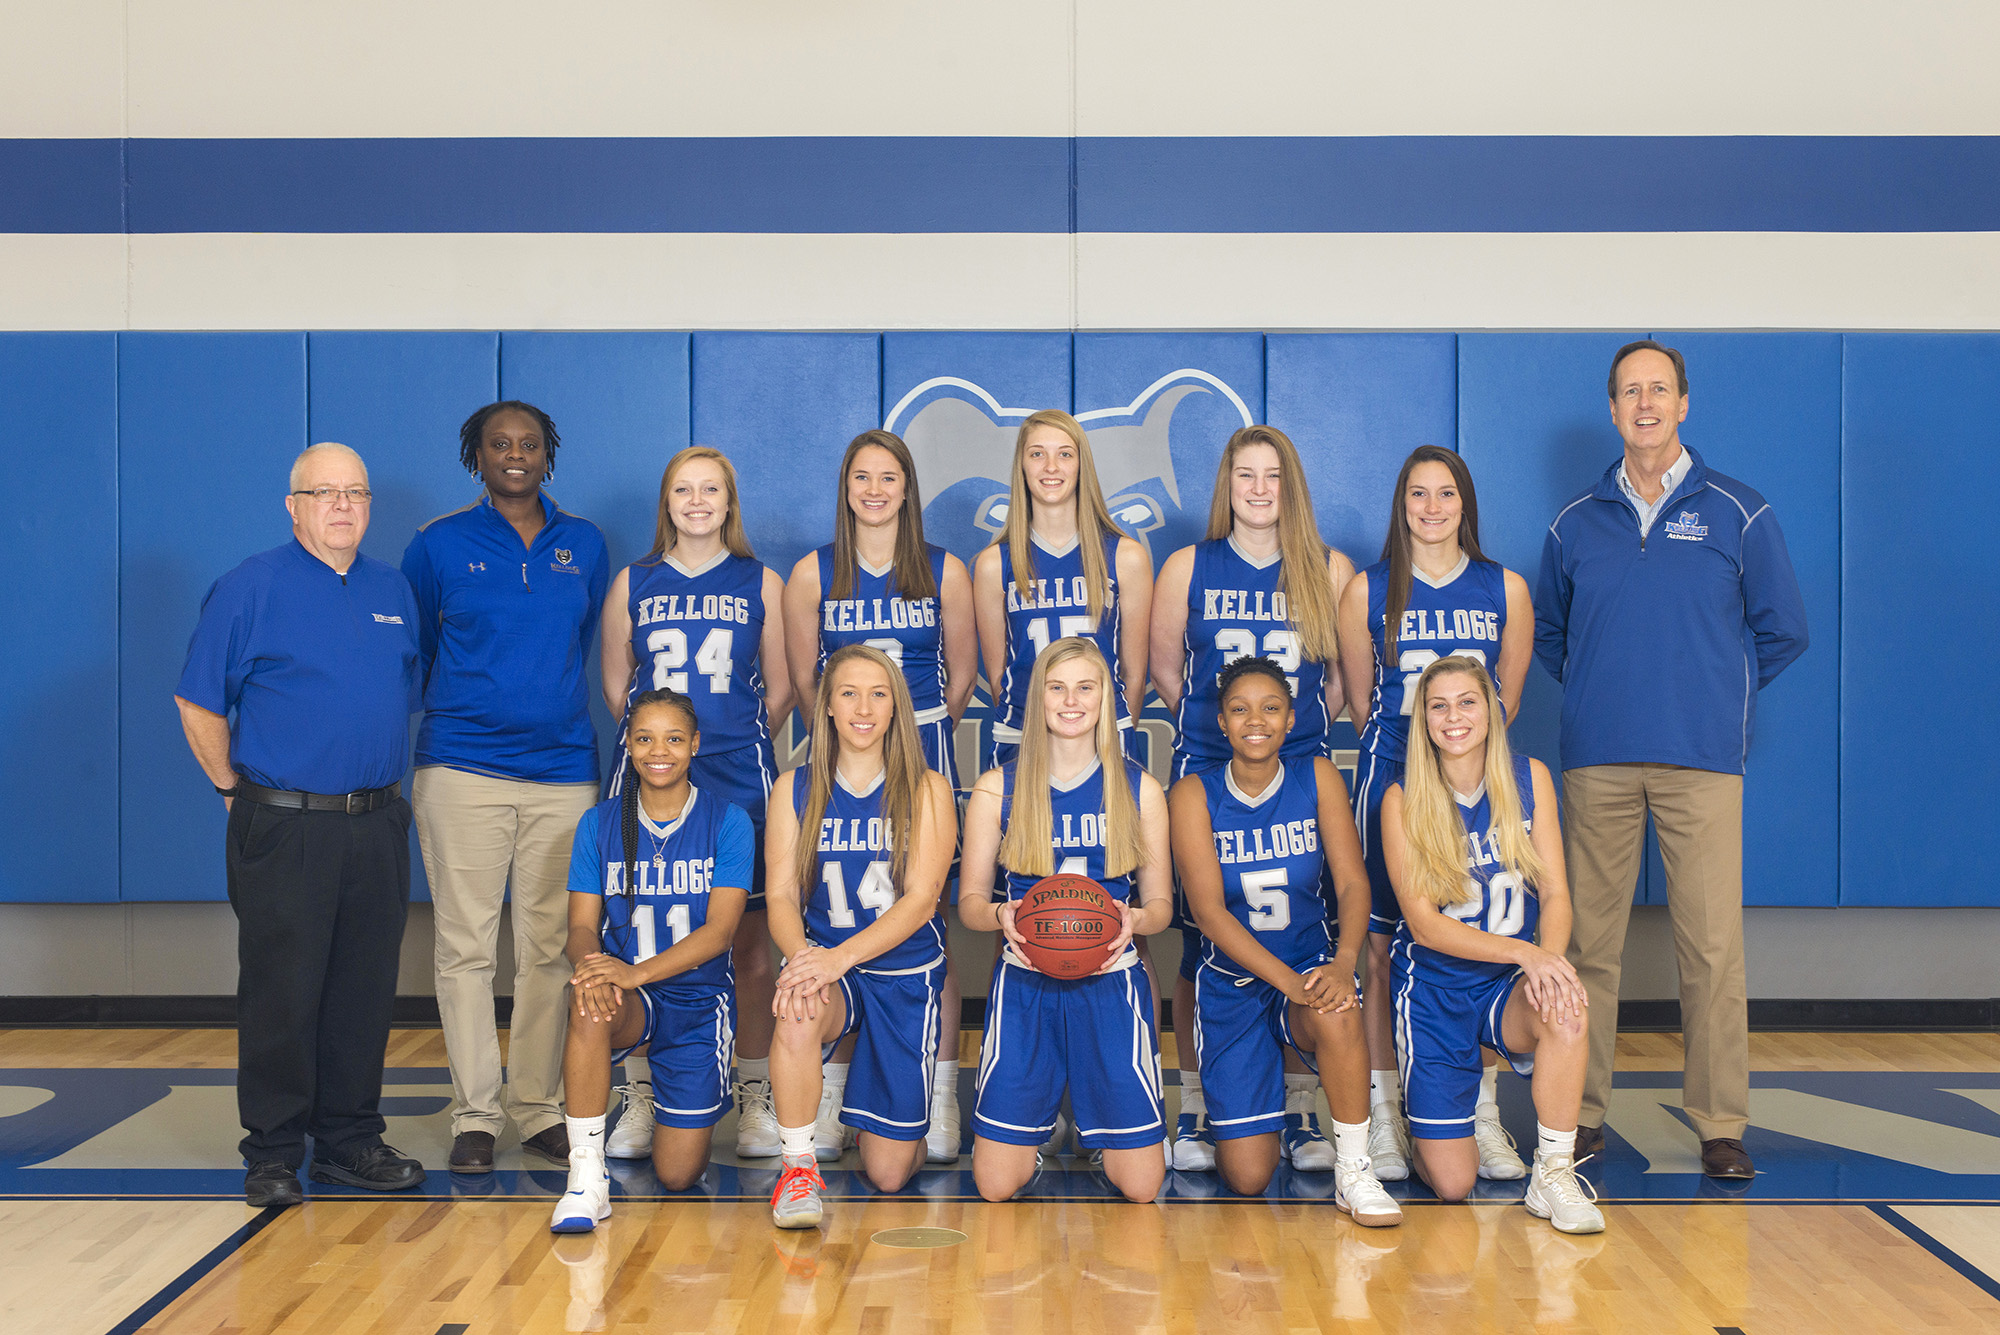 KCC's 2018-19 women's basketball team